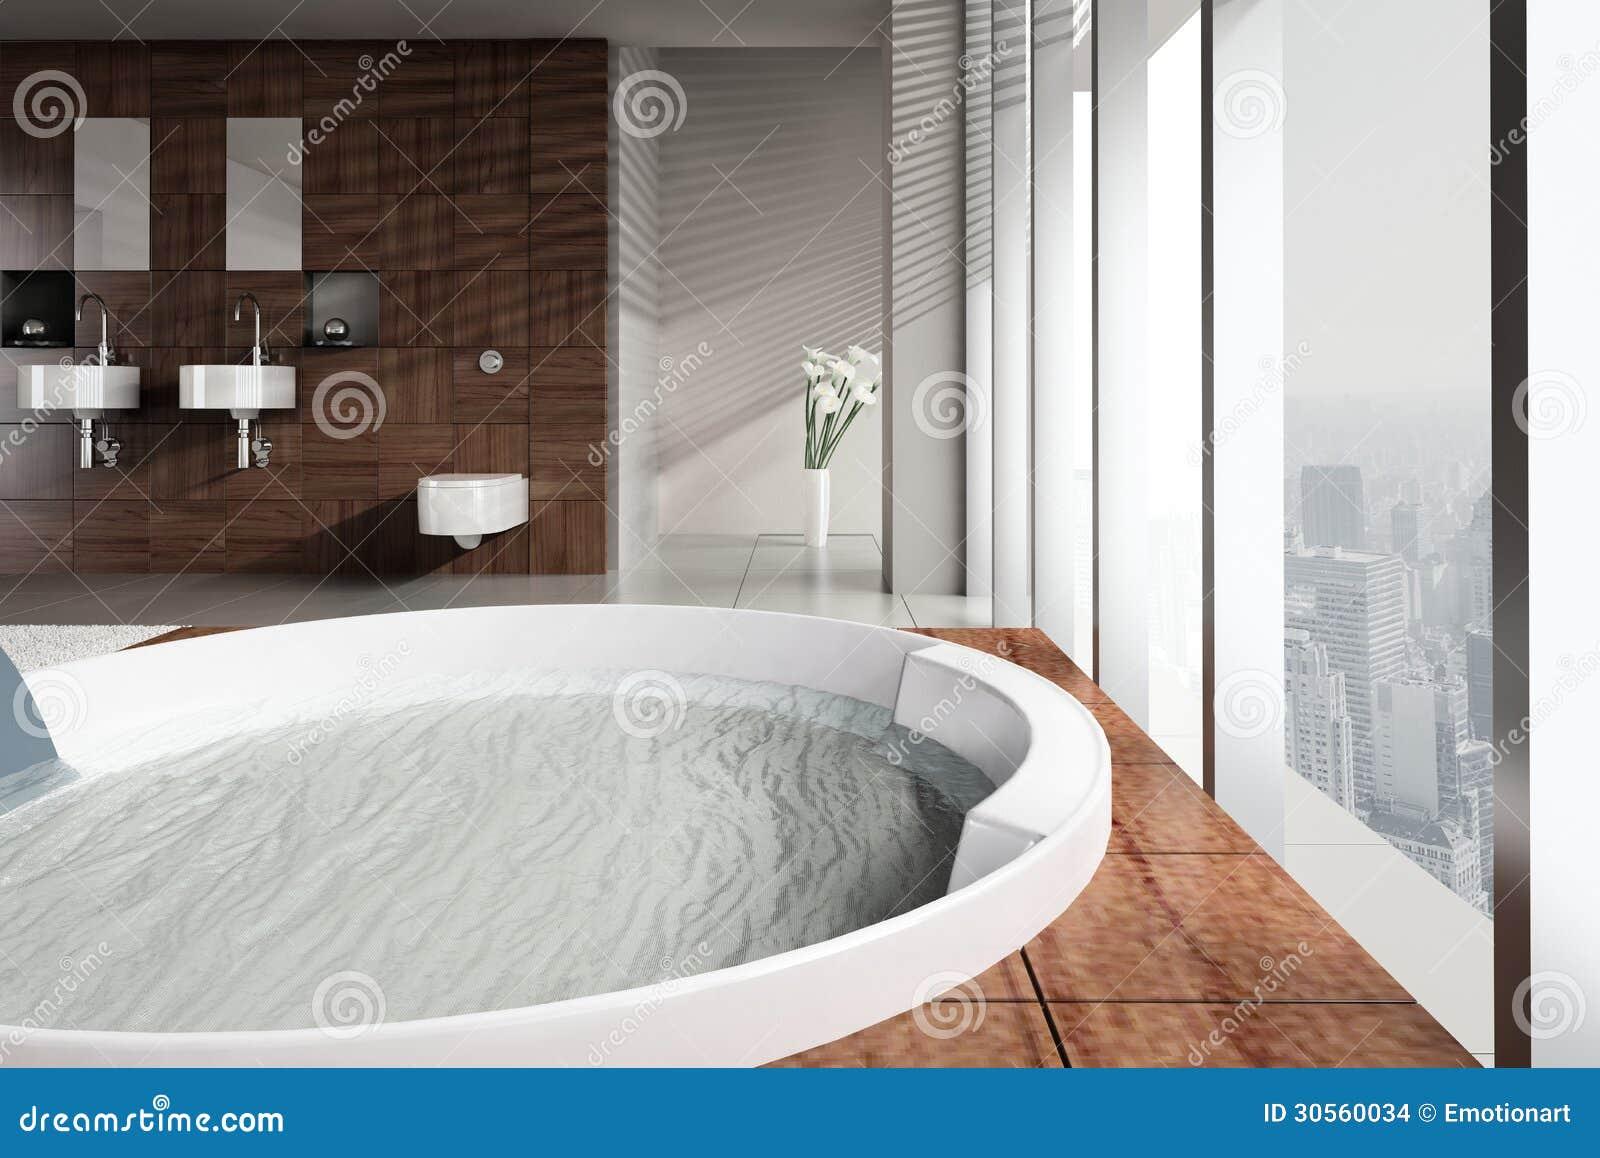 Decoracion Baño Cuadros ~ Dikidu.com